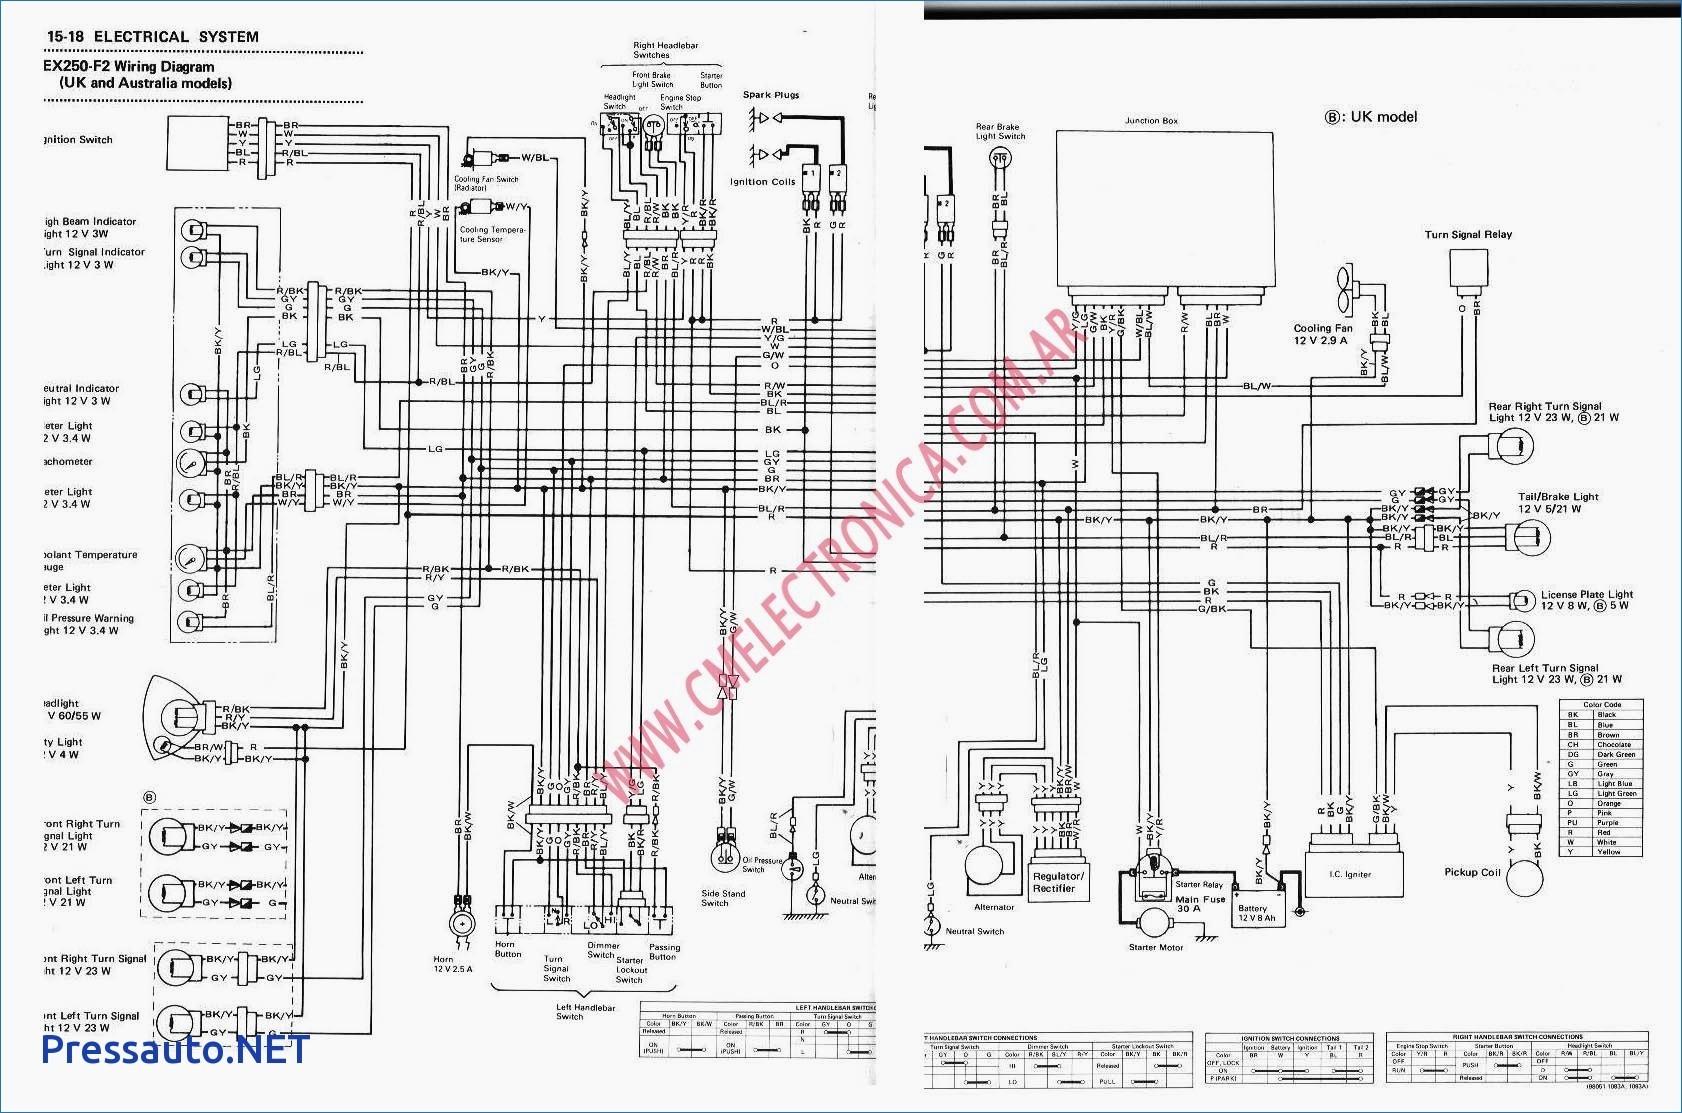 [DIAGRAM] Kawasaki Bayou Wiring Diagram FULL Version HD